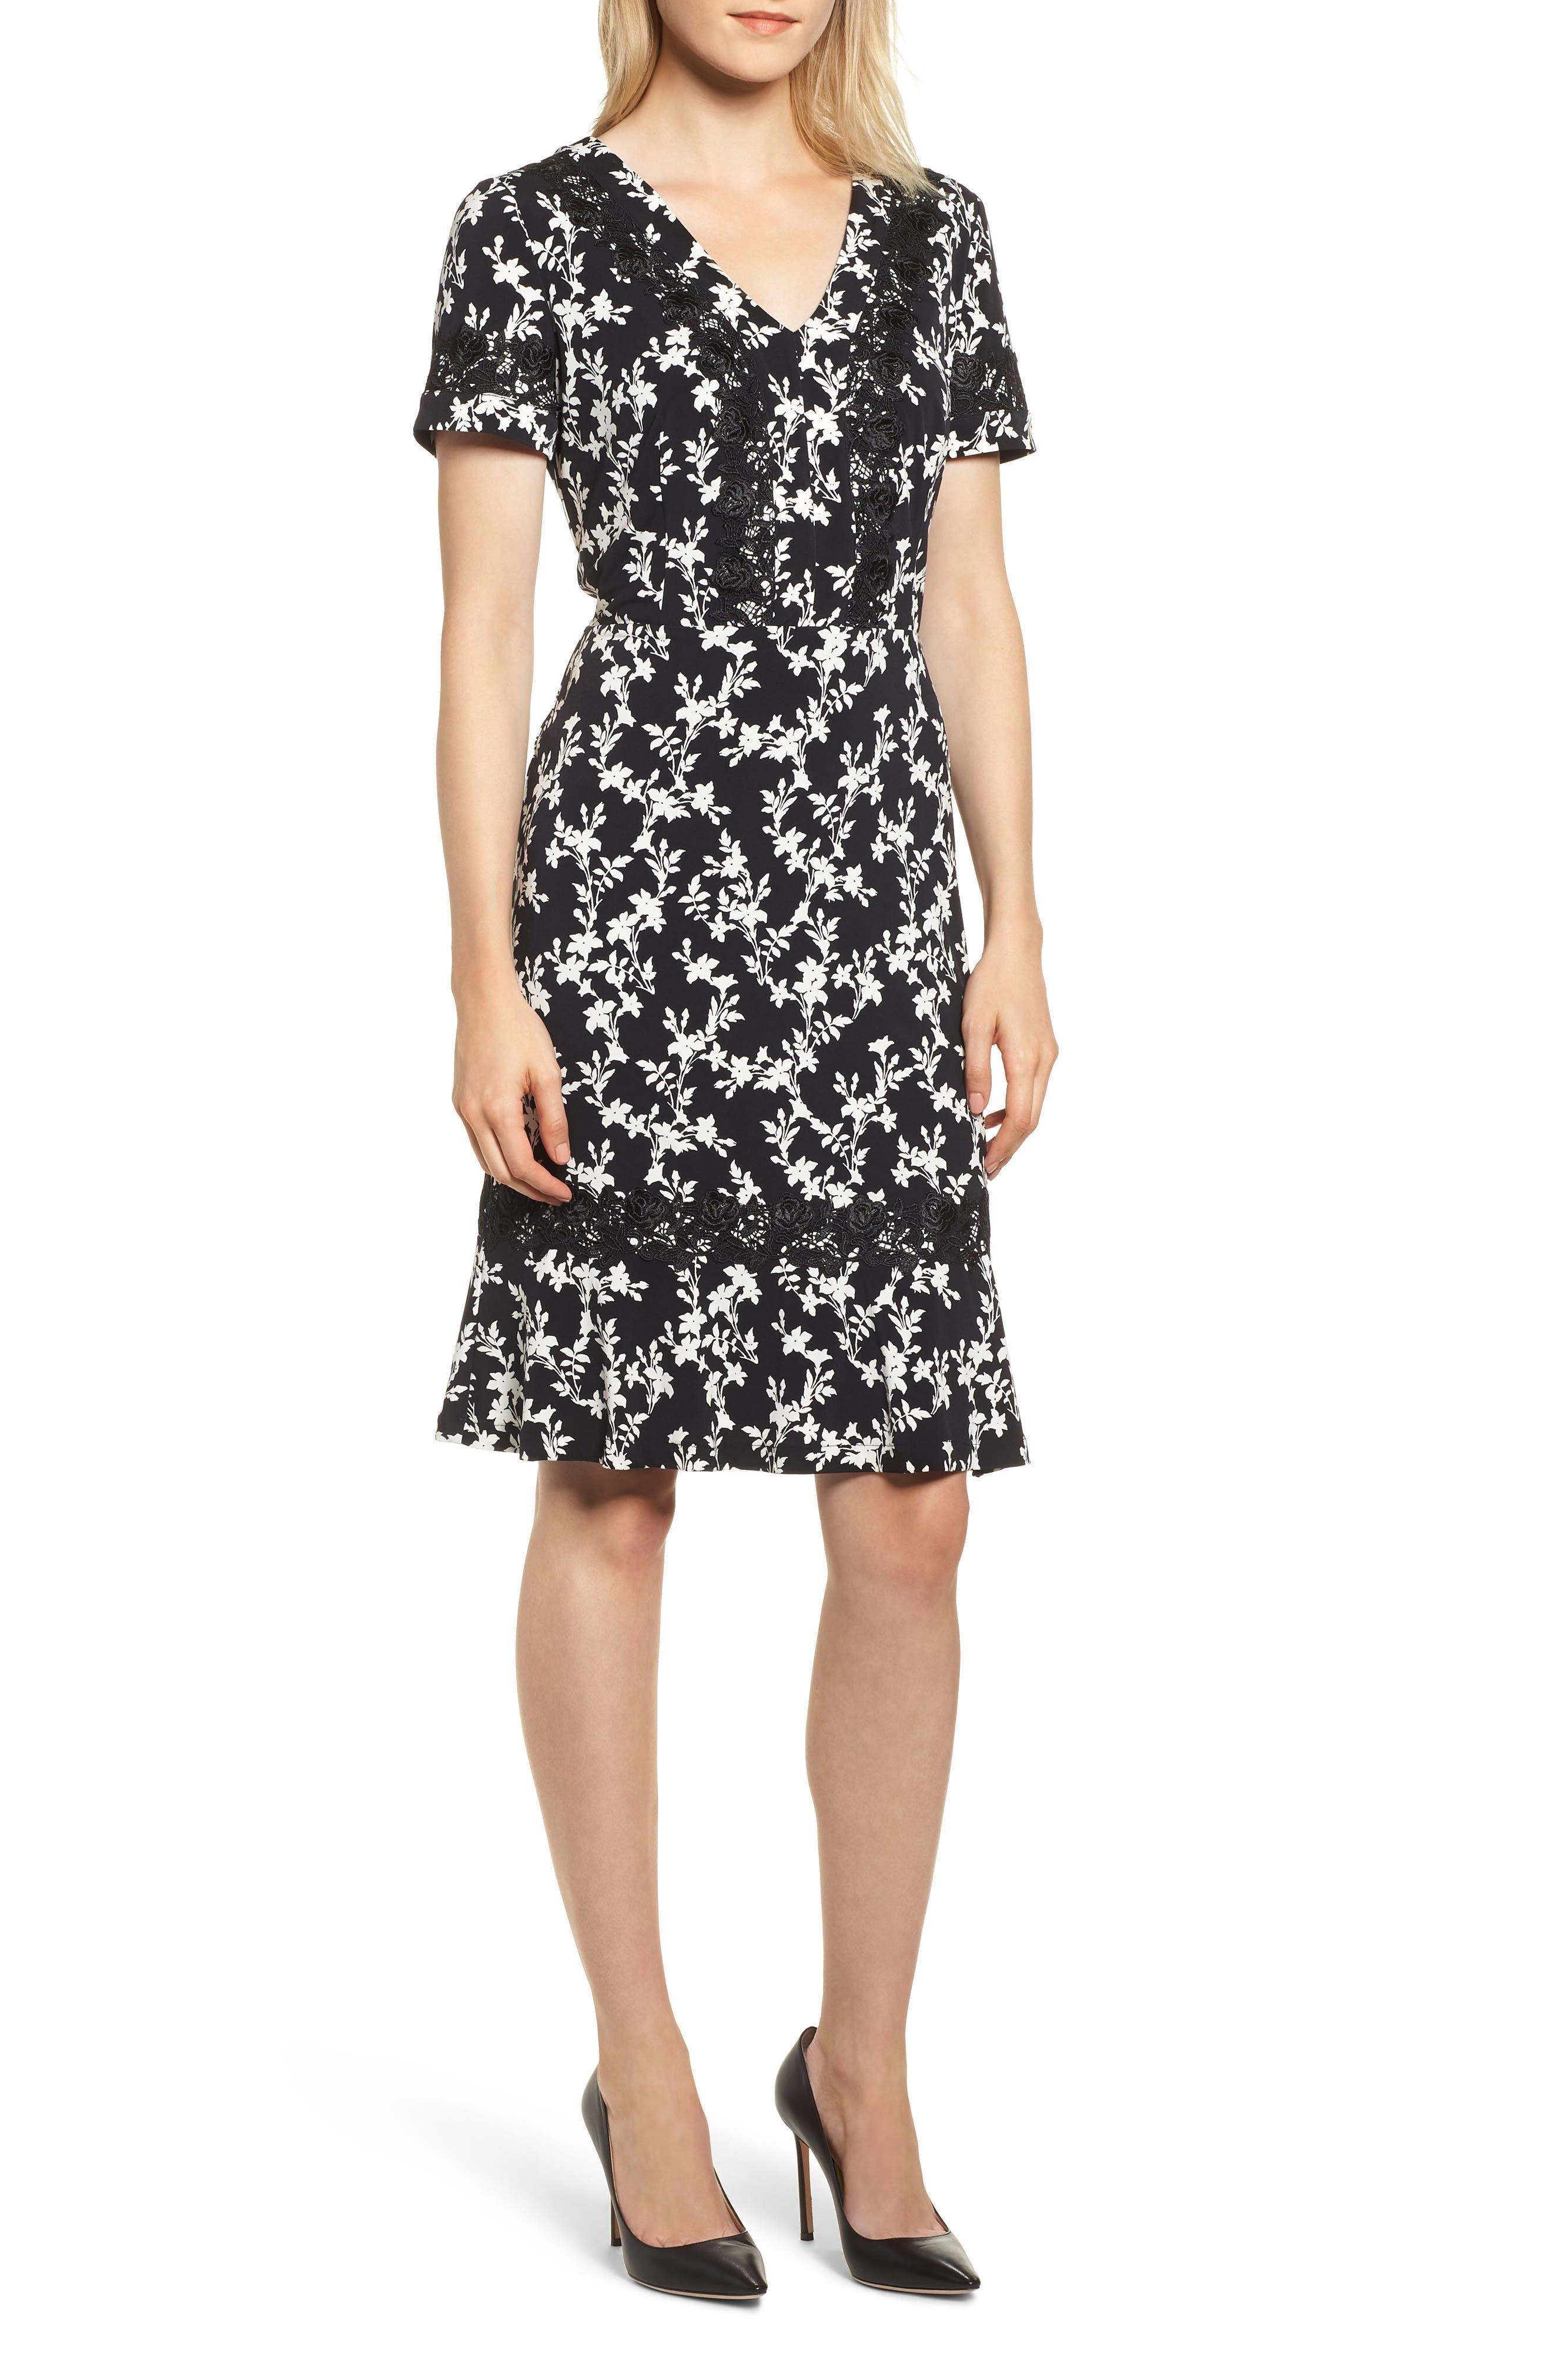 KARL LAGERFELD Floral-Print Short-Sleeve A-Line Dress in Multi